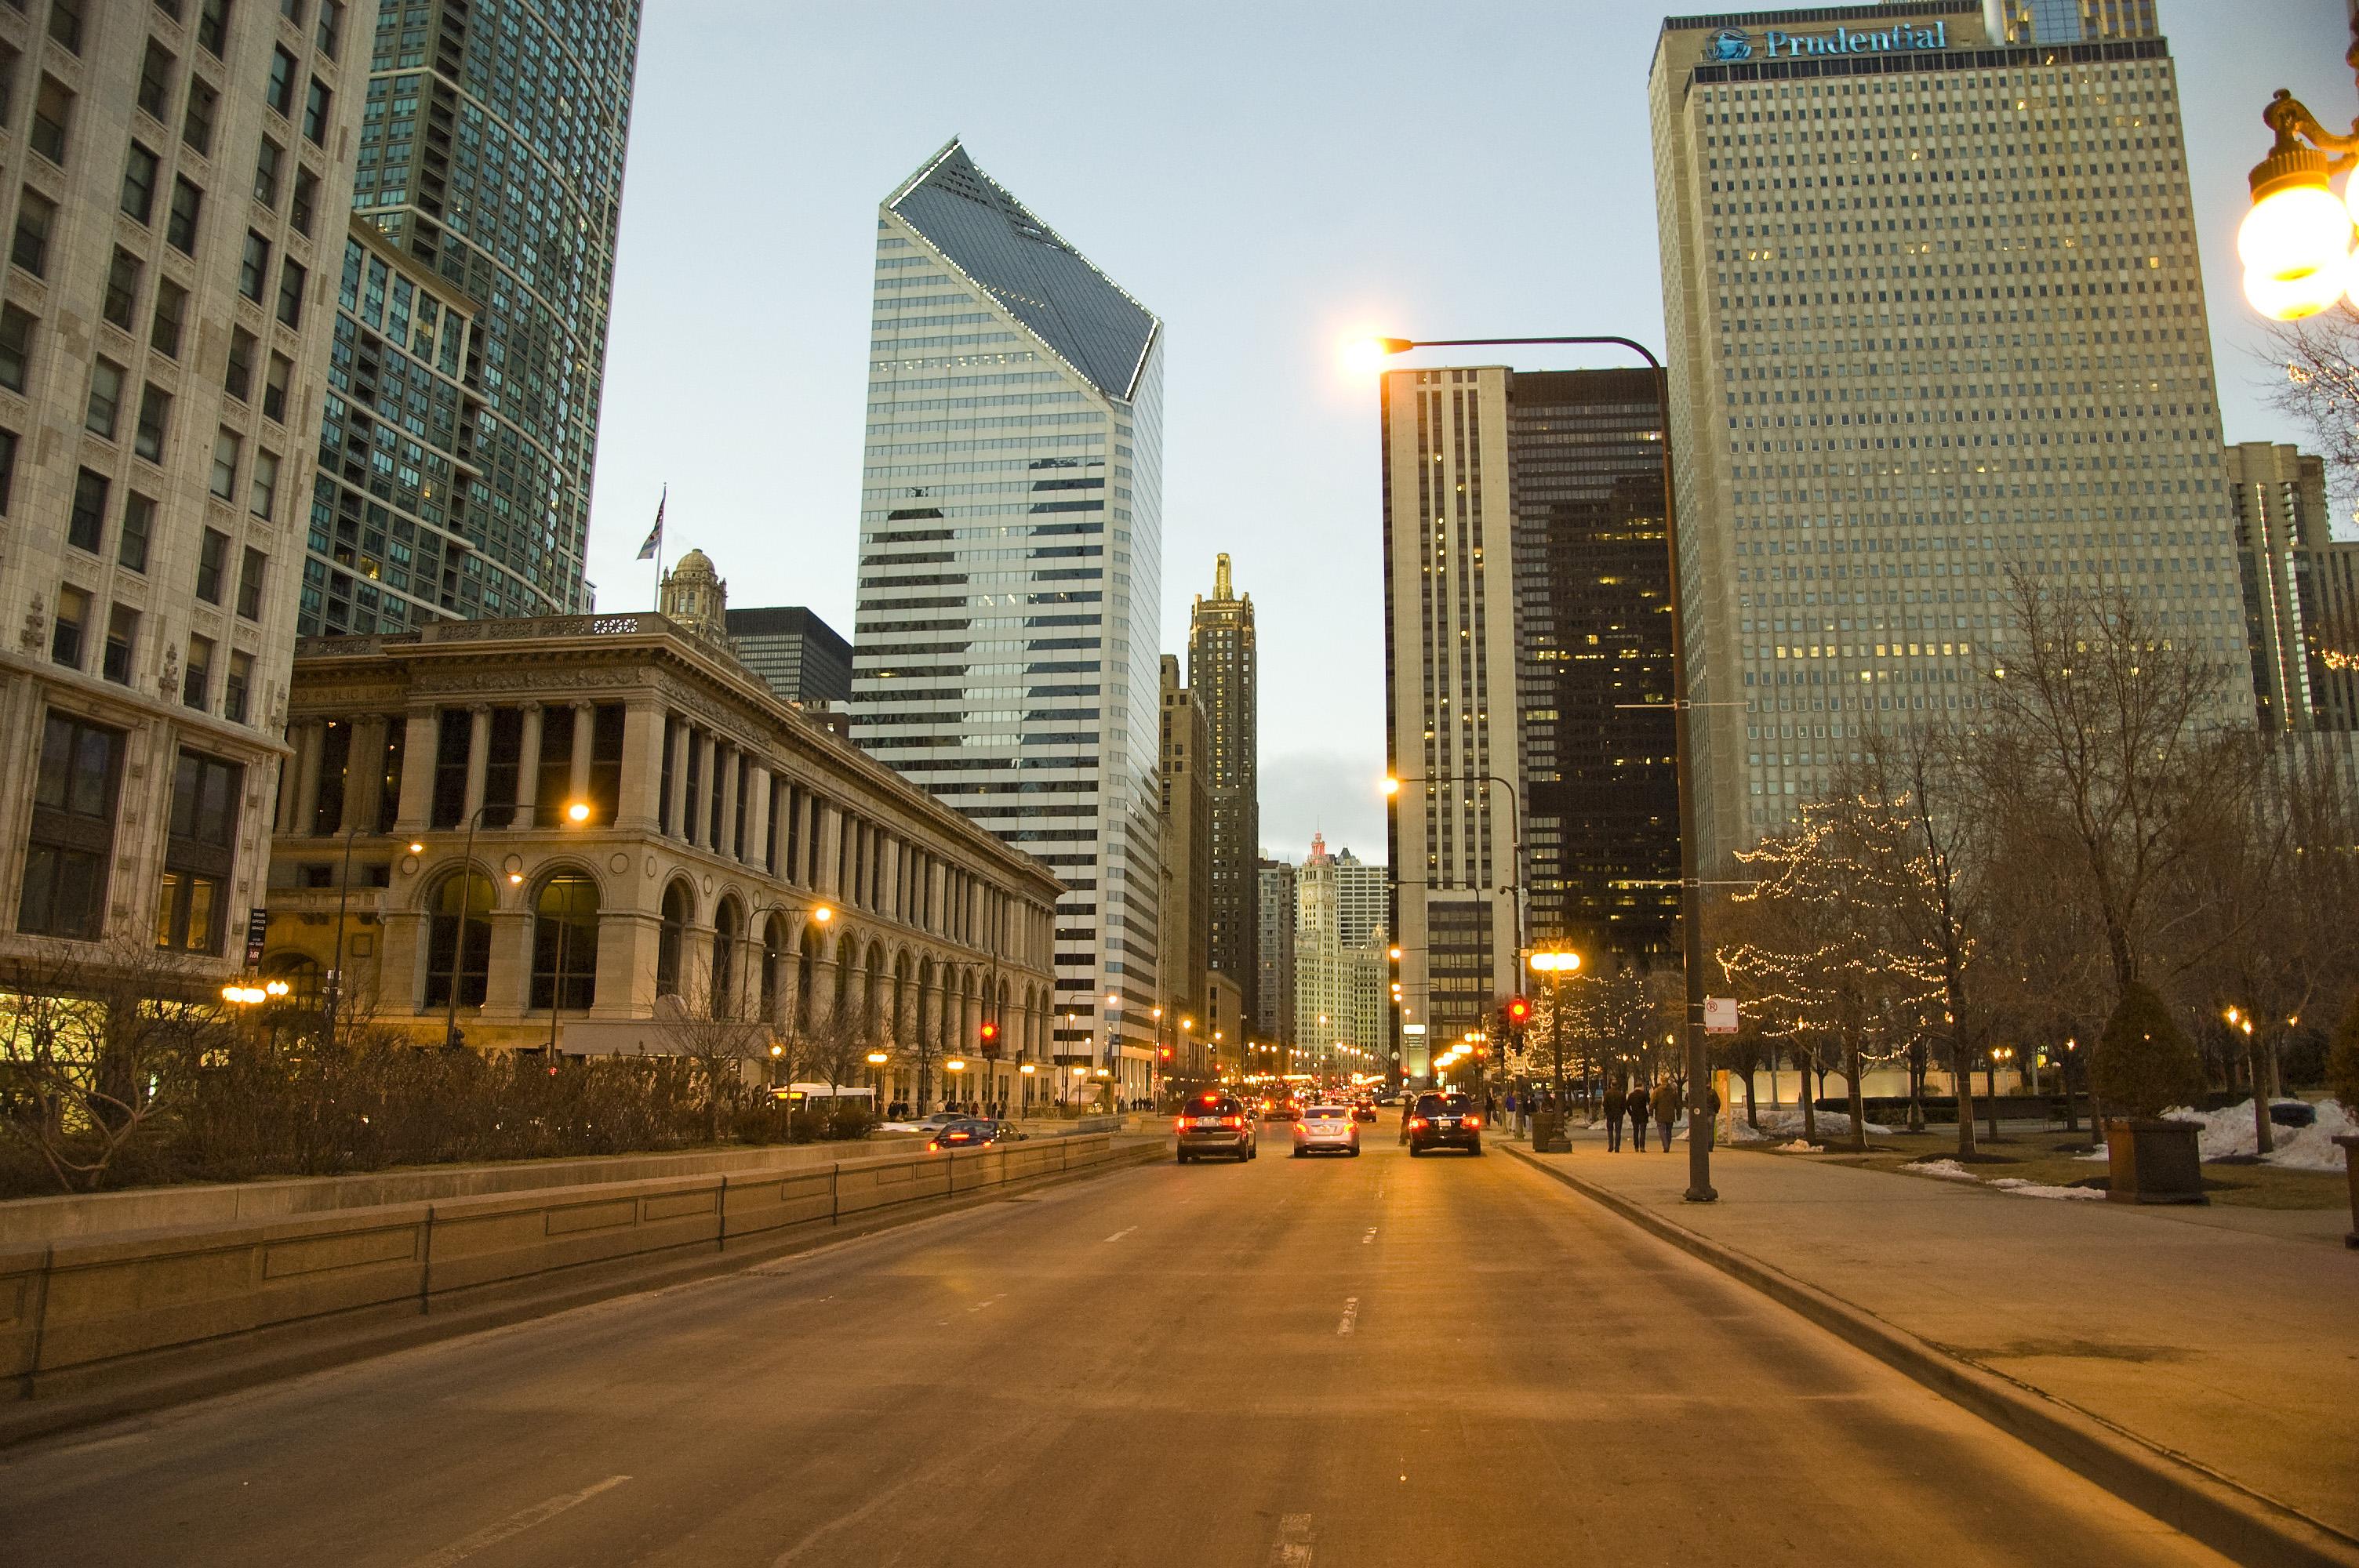 Обои ж/д дорога, небоскребы, chicago, чикаго. Города foto 19